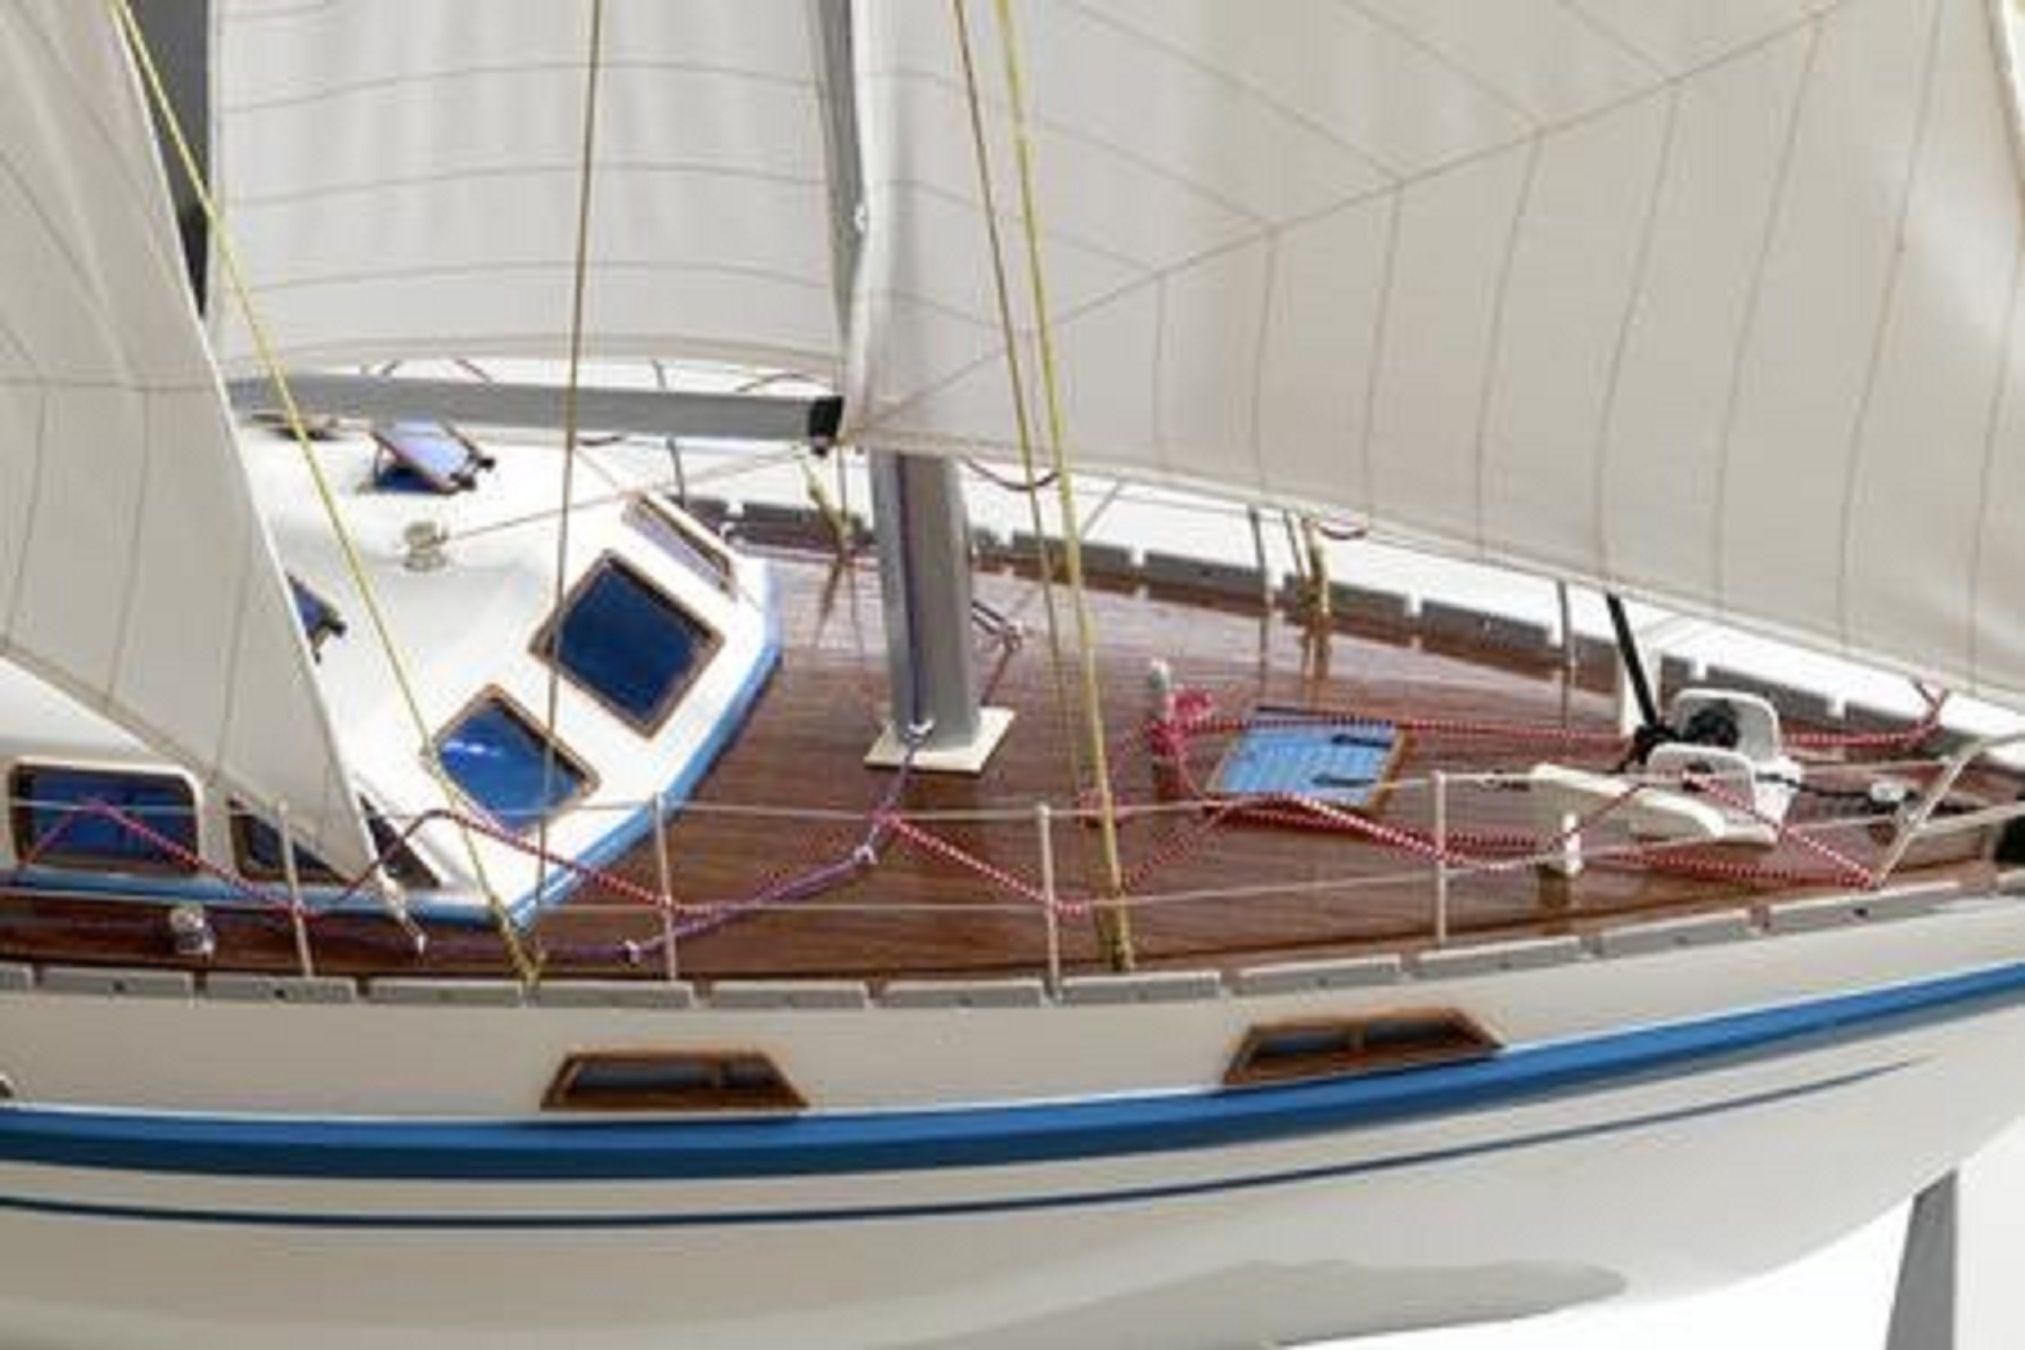 164-6834-Colvic-Victor-40-model-yacht